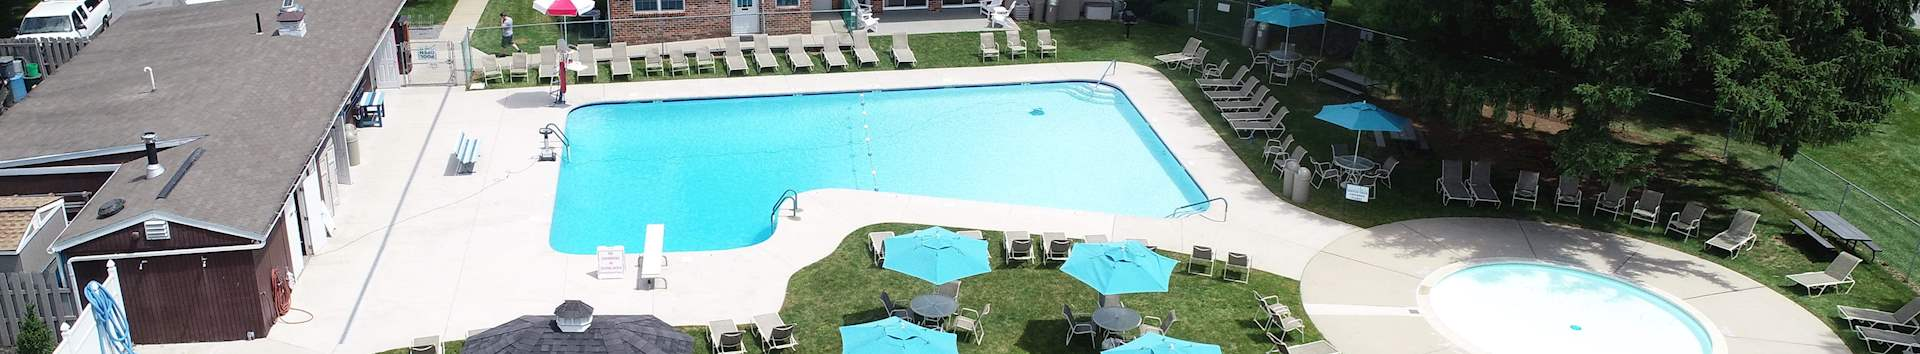 Swimming Pool of Springetts Apartments at Manor Communities, York/Pennsylvania